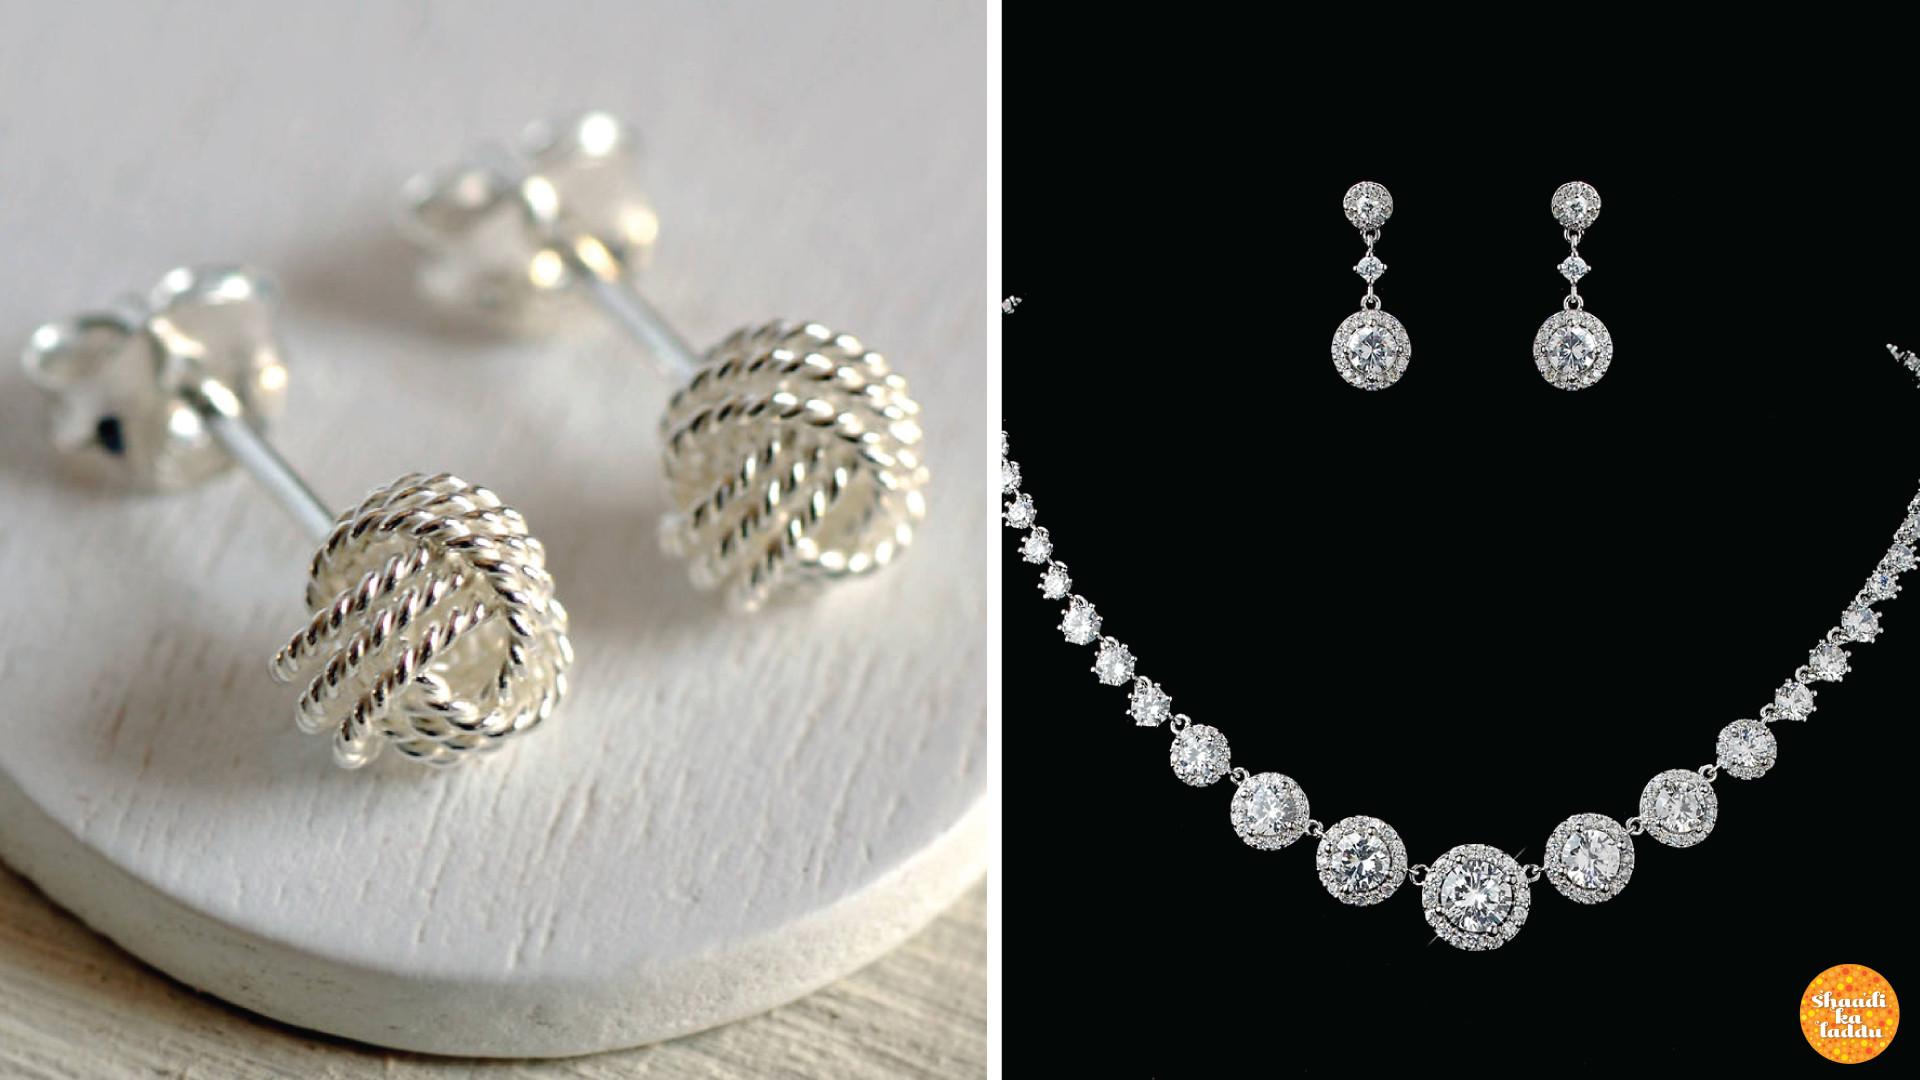 Blue stone wedding jewellery collection